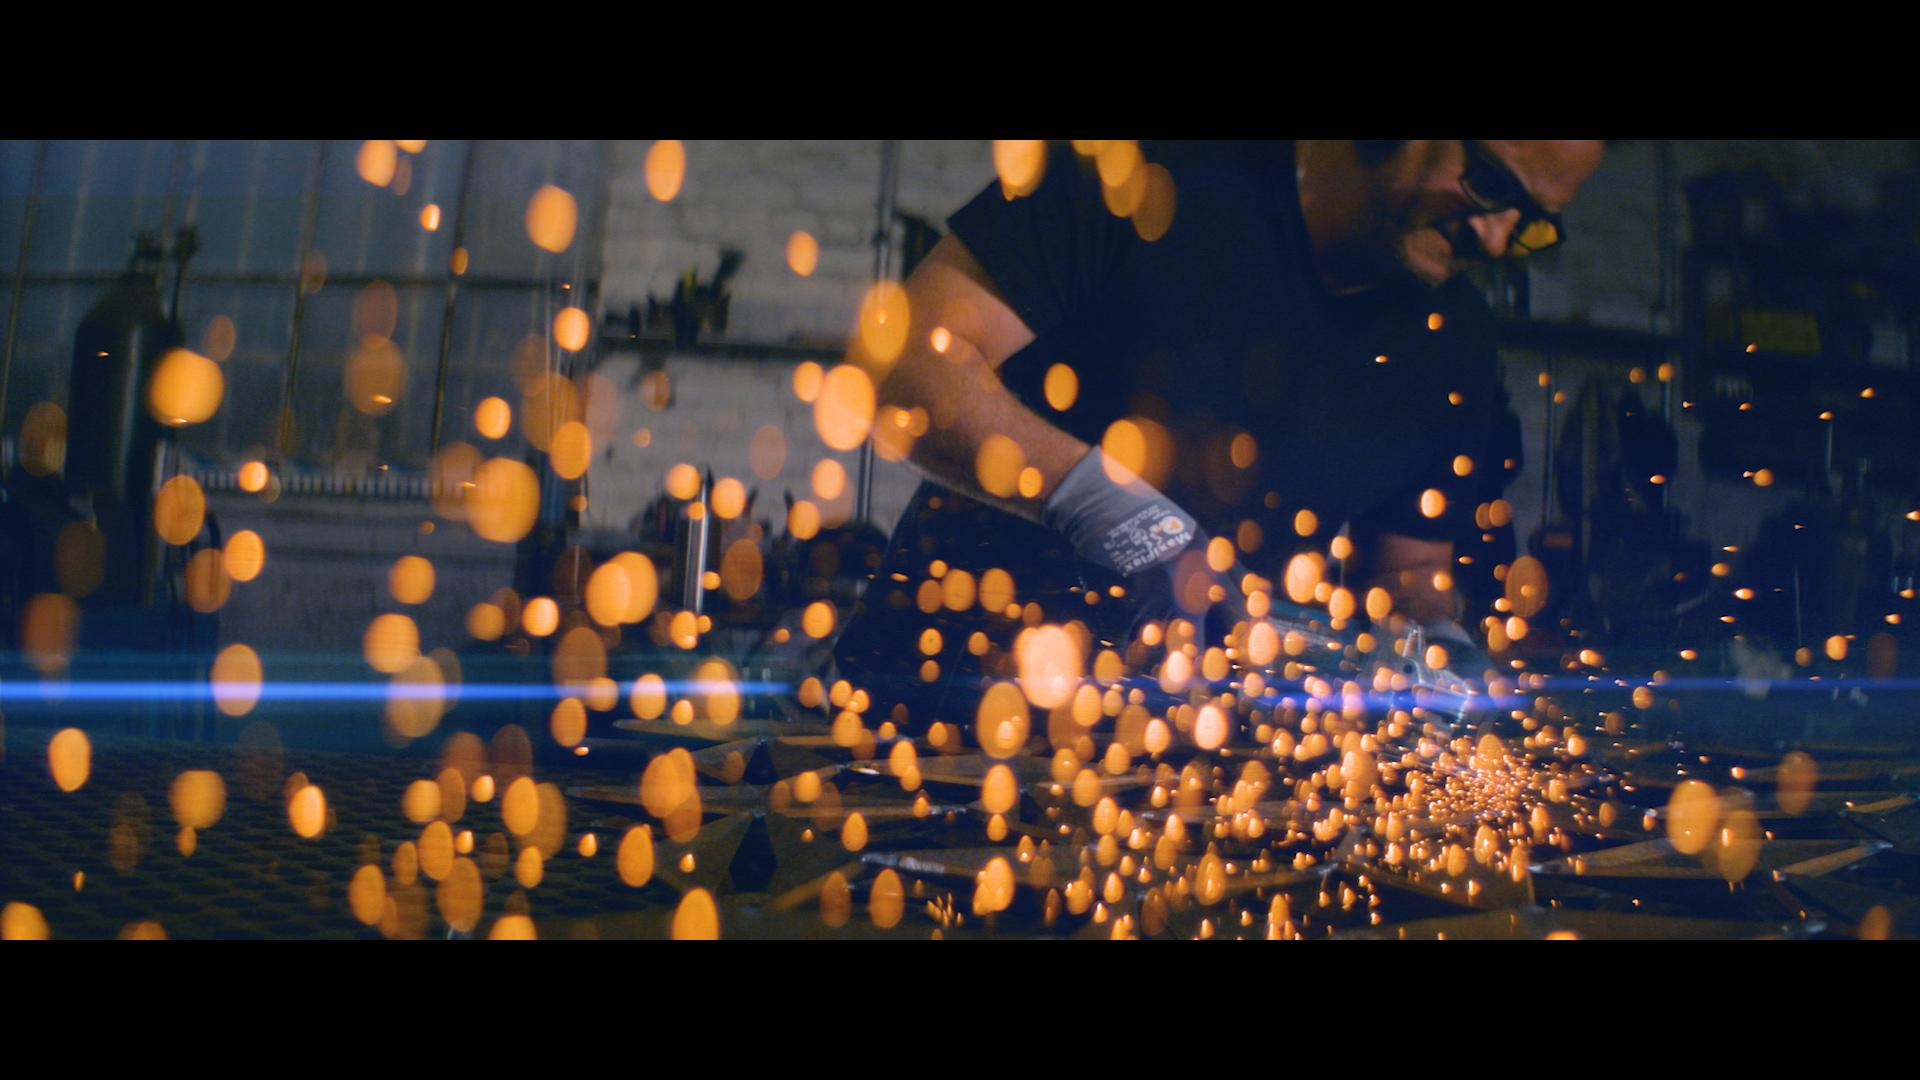 Squarespace Commercial.00_00_36_05.Still041.jpg